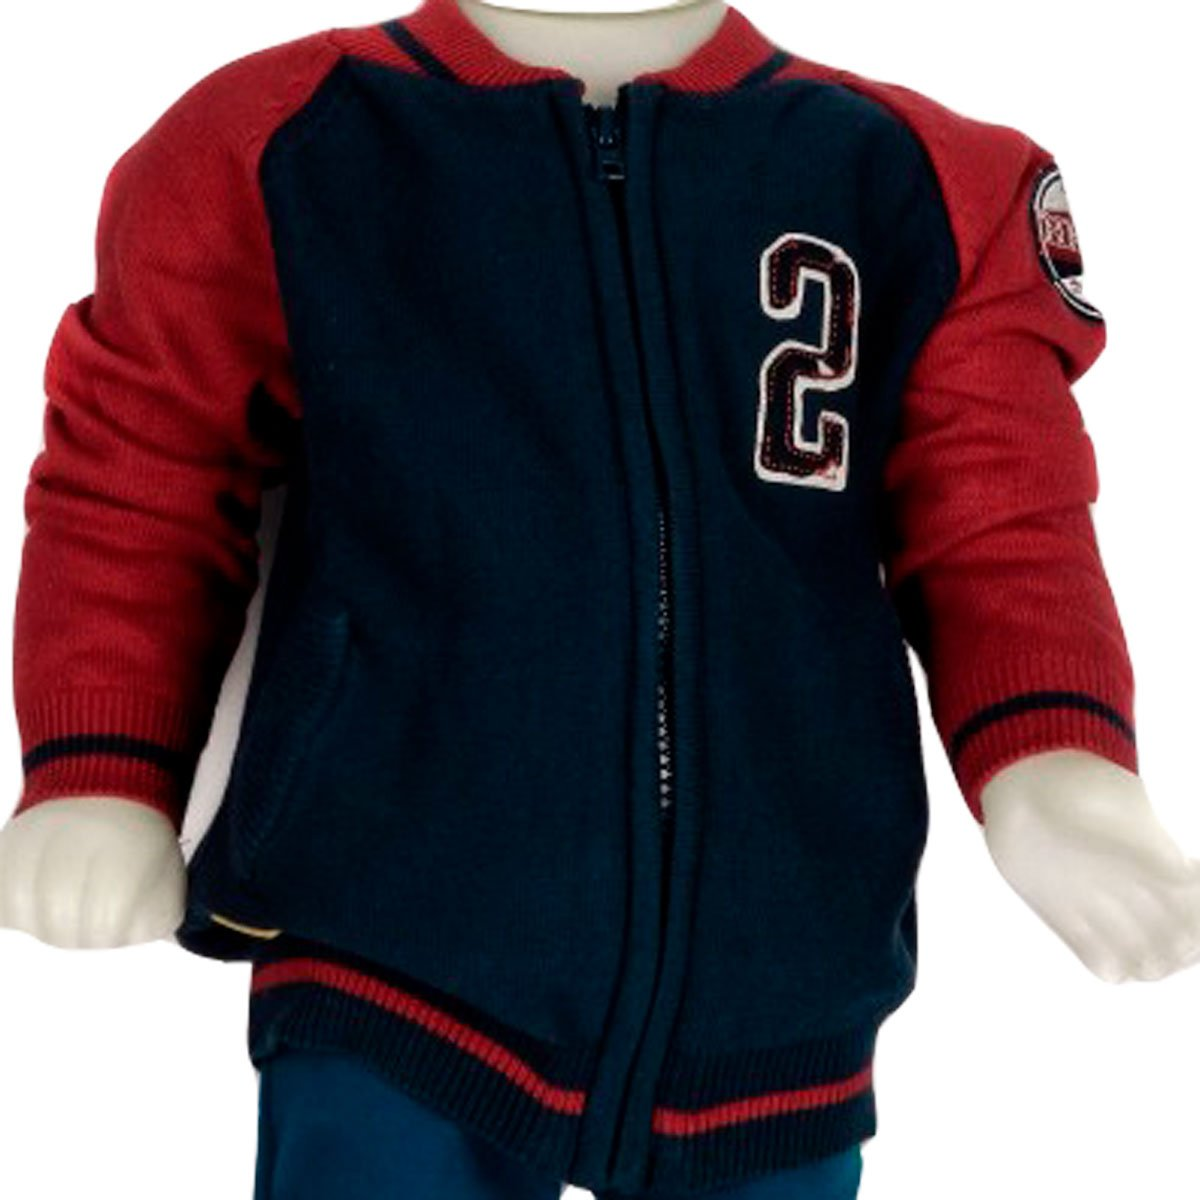 a6a630919a Bizz Store - Jaqueta Infantil Masculina Hering Kids Moletom